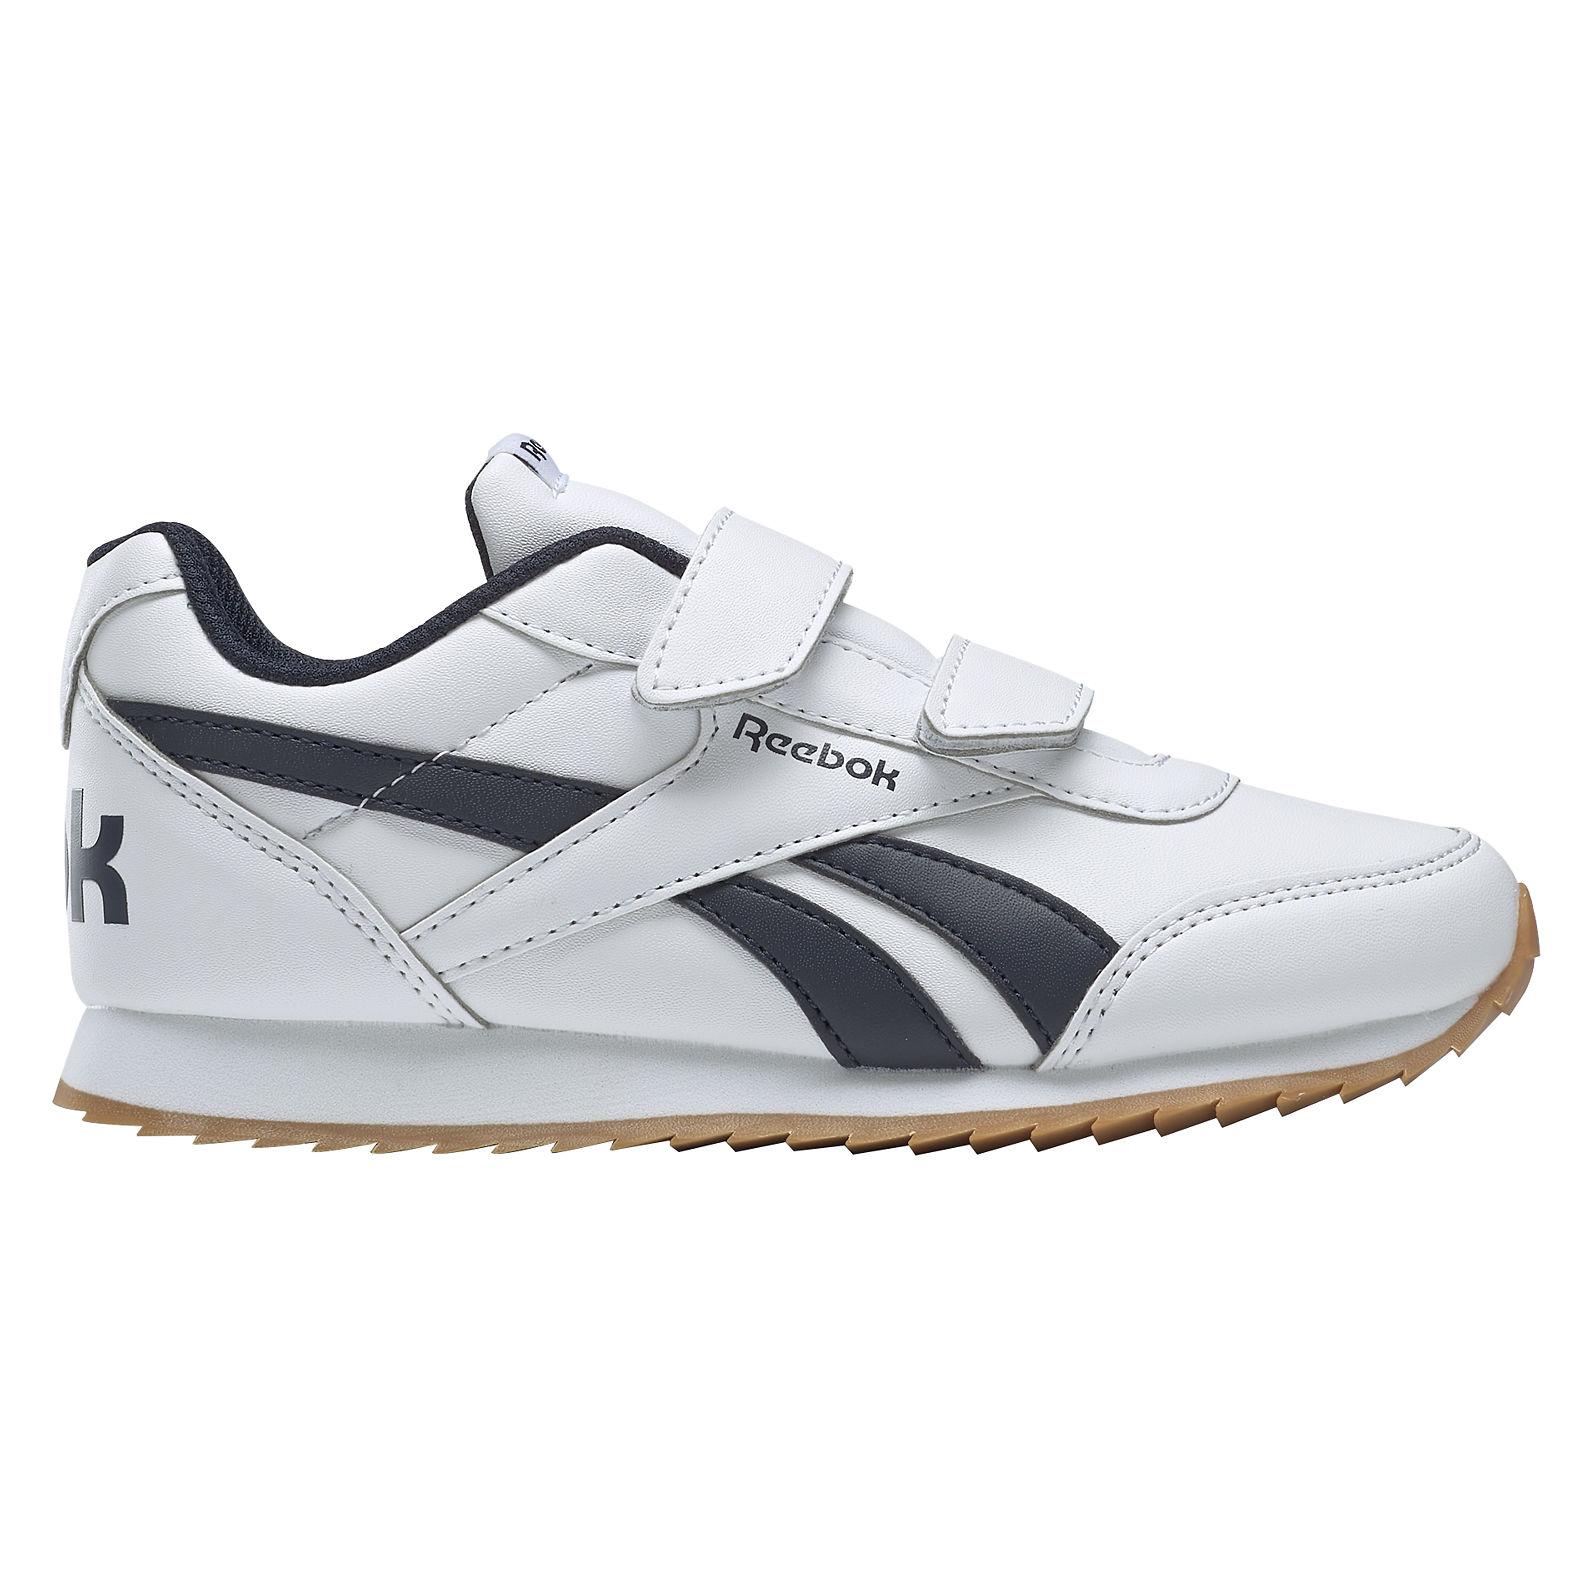 Buty chłopięce Reebok Royal Classic Jogger 2.0 DV9092